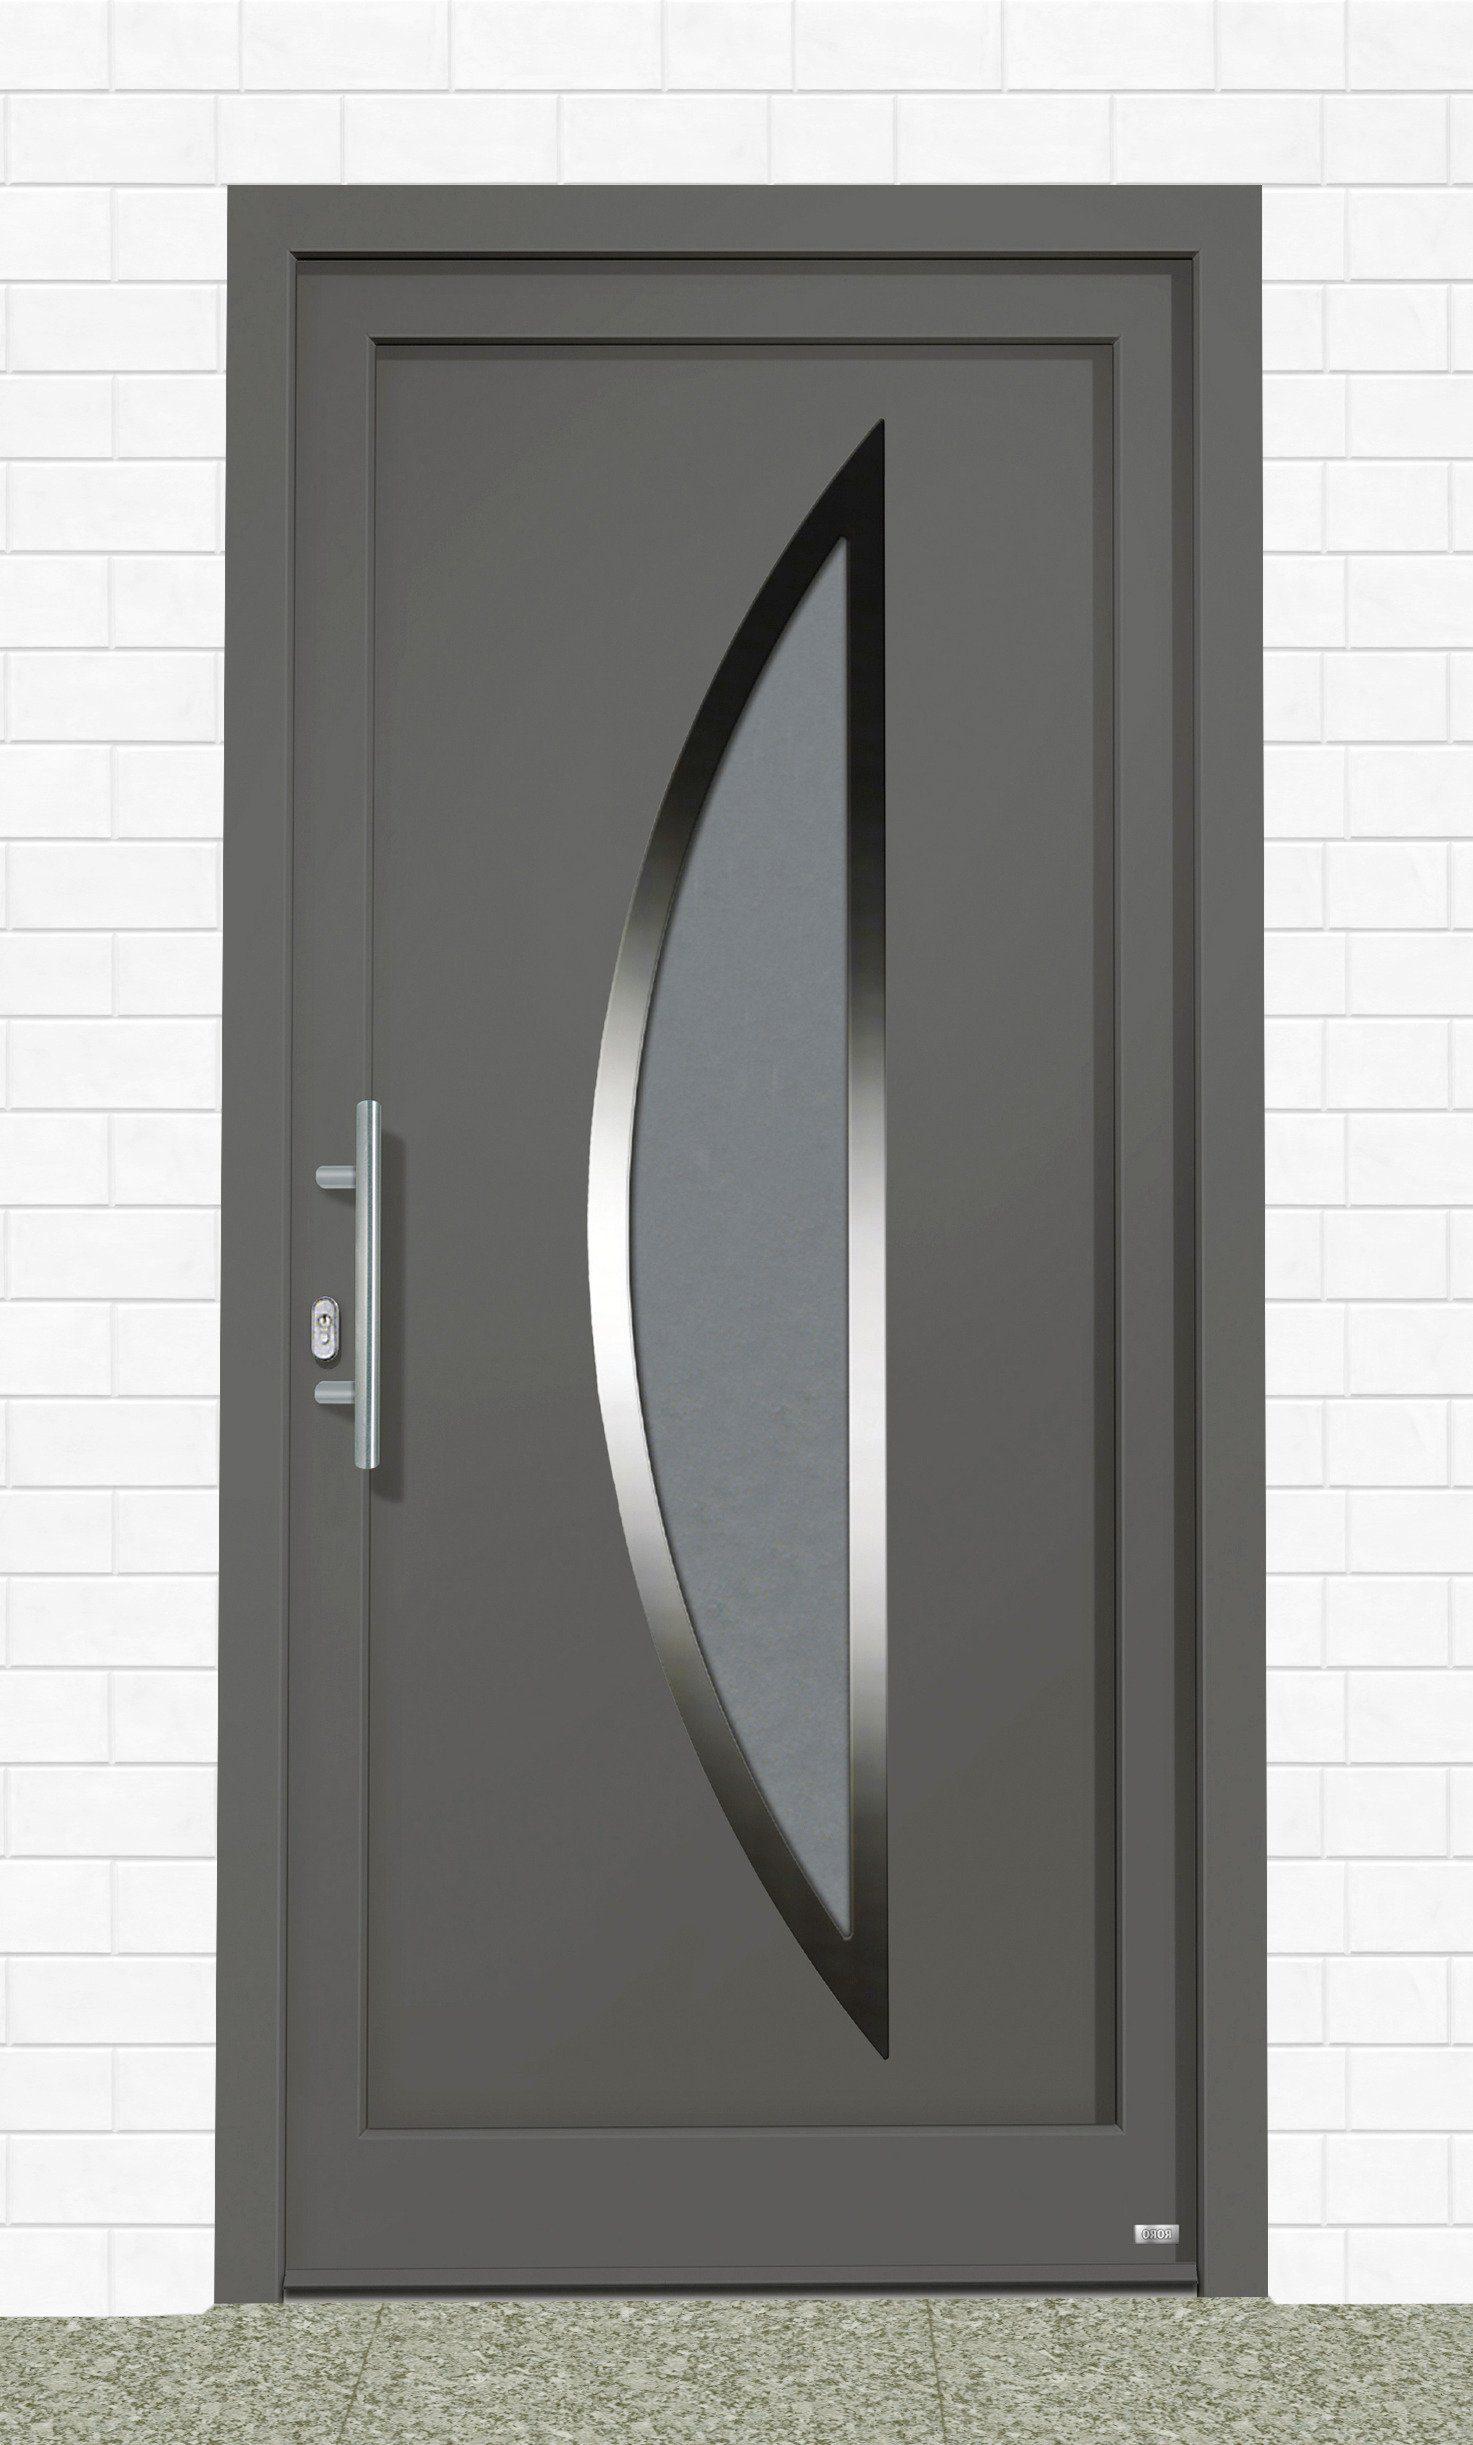 roro kunststoff haust r kanada bxh 100 x 210 cm. Black Bedroom Furniture Sets. Home Design Ideas